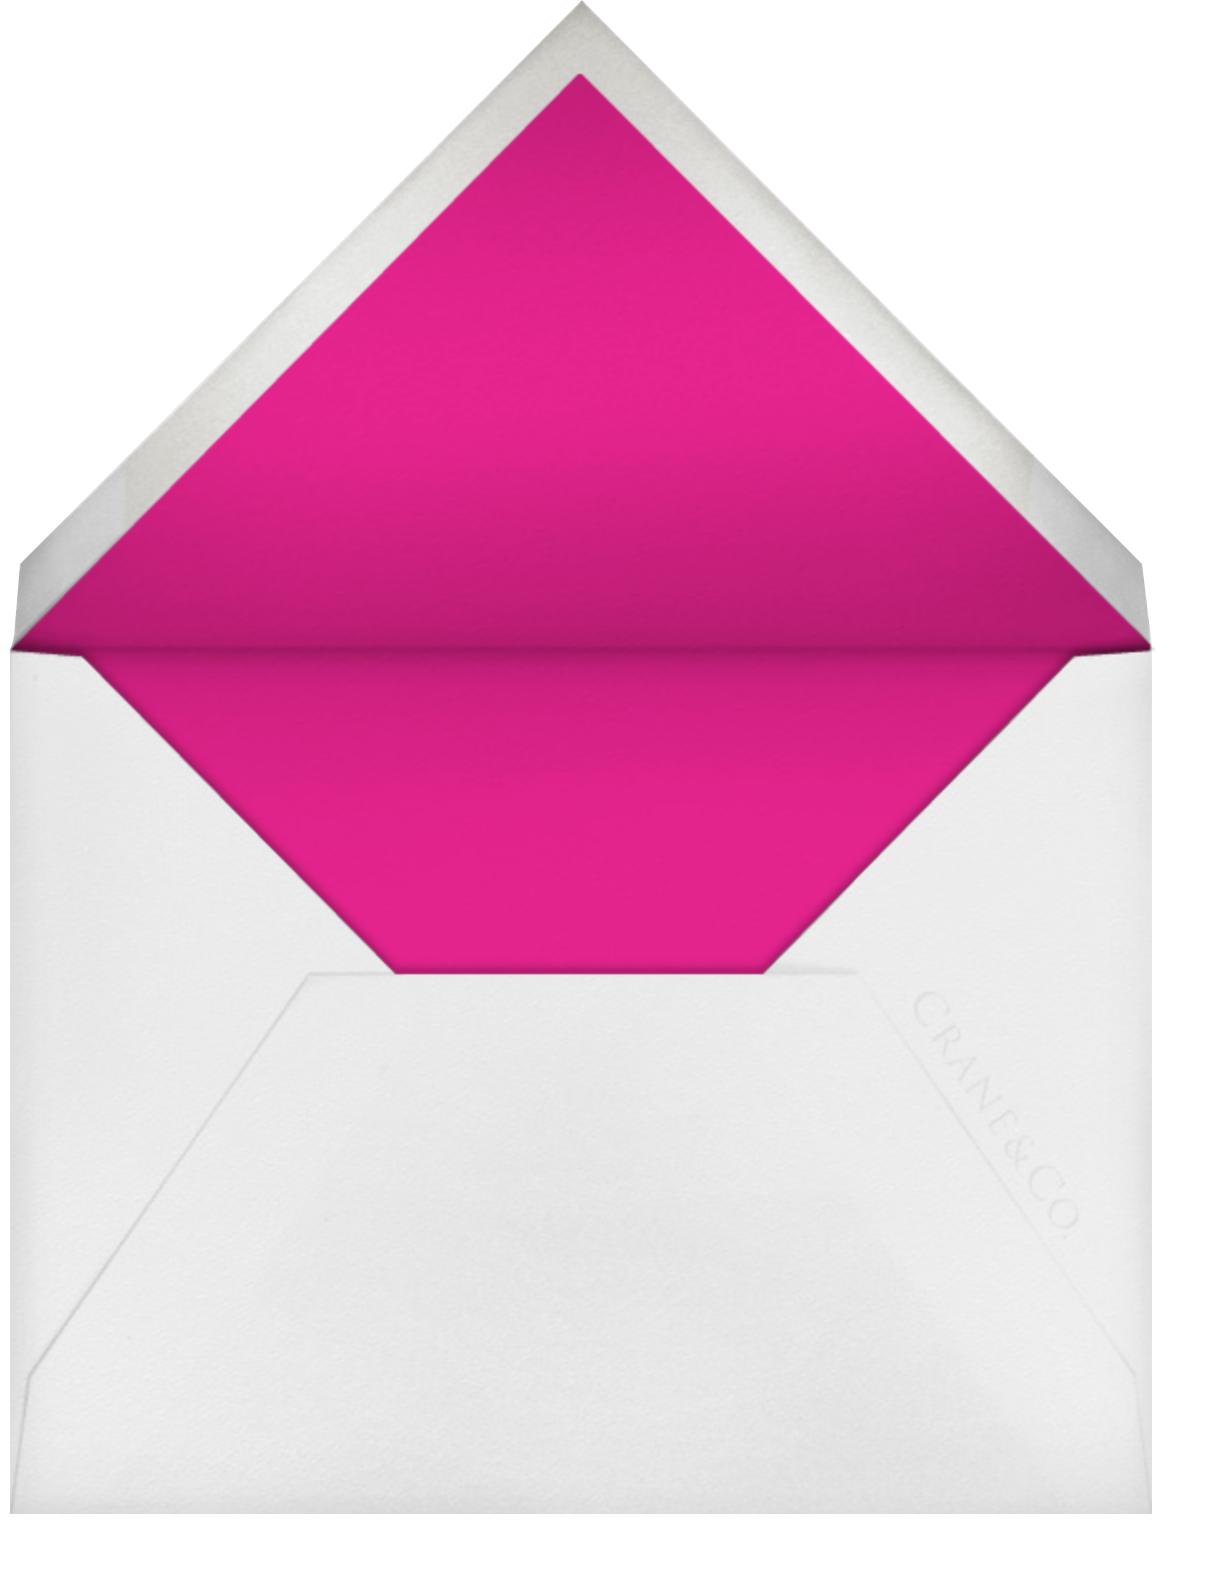 Silk Brocade I - Raspberry - Oscar de la Renta - Envelope